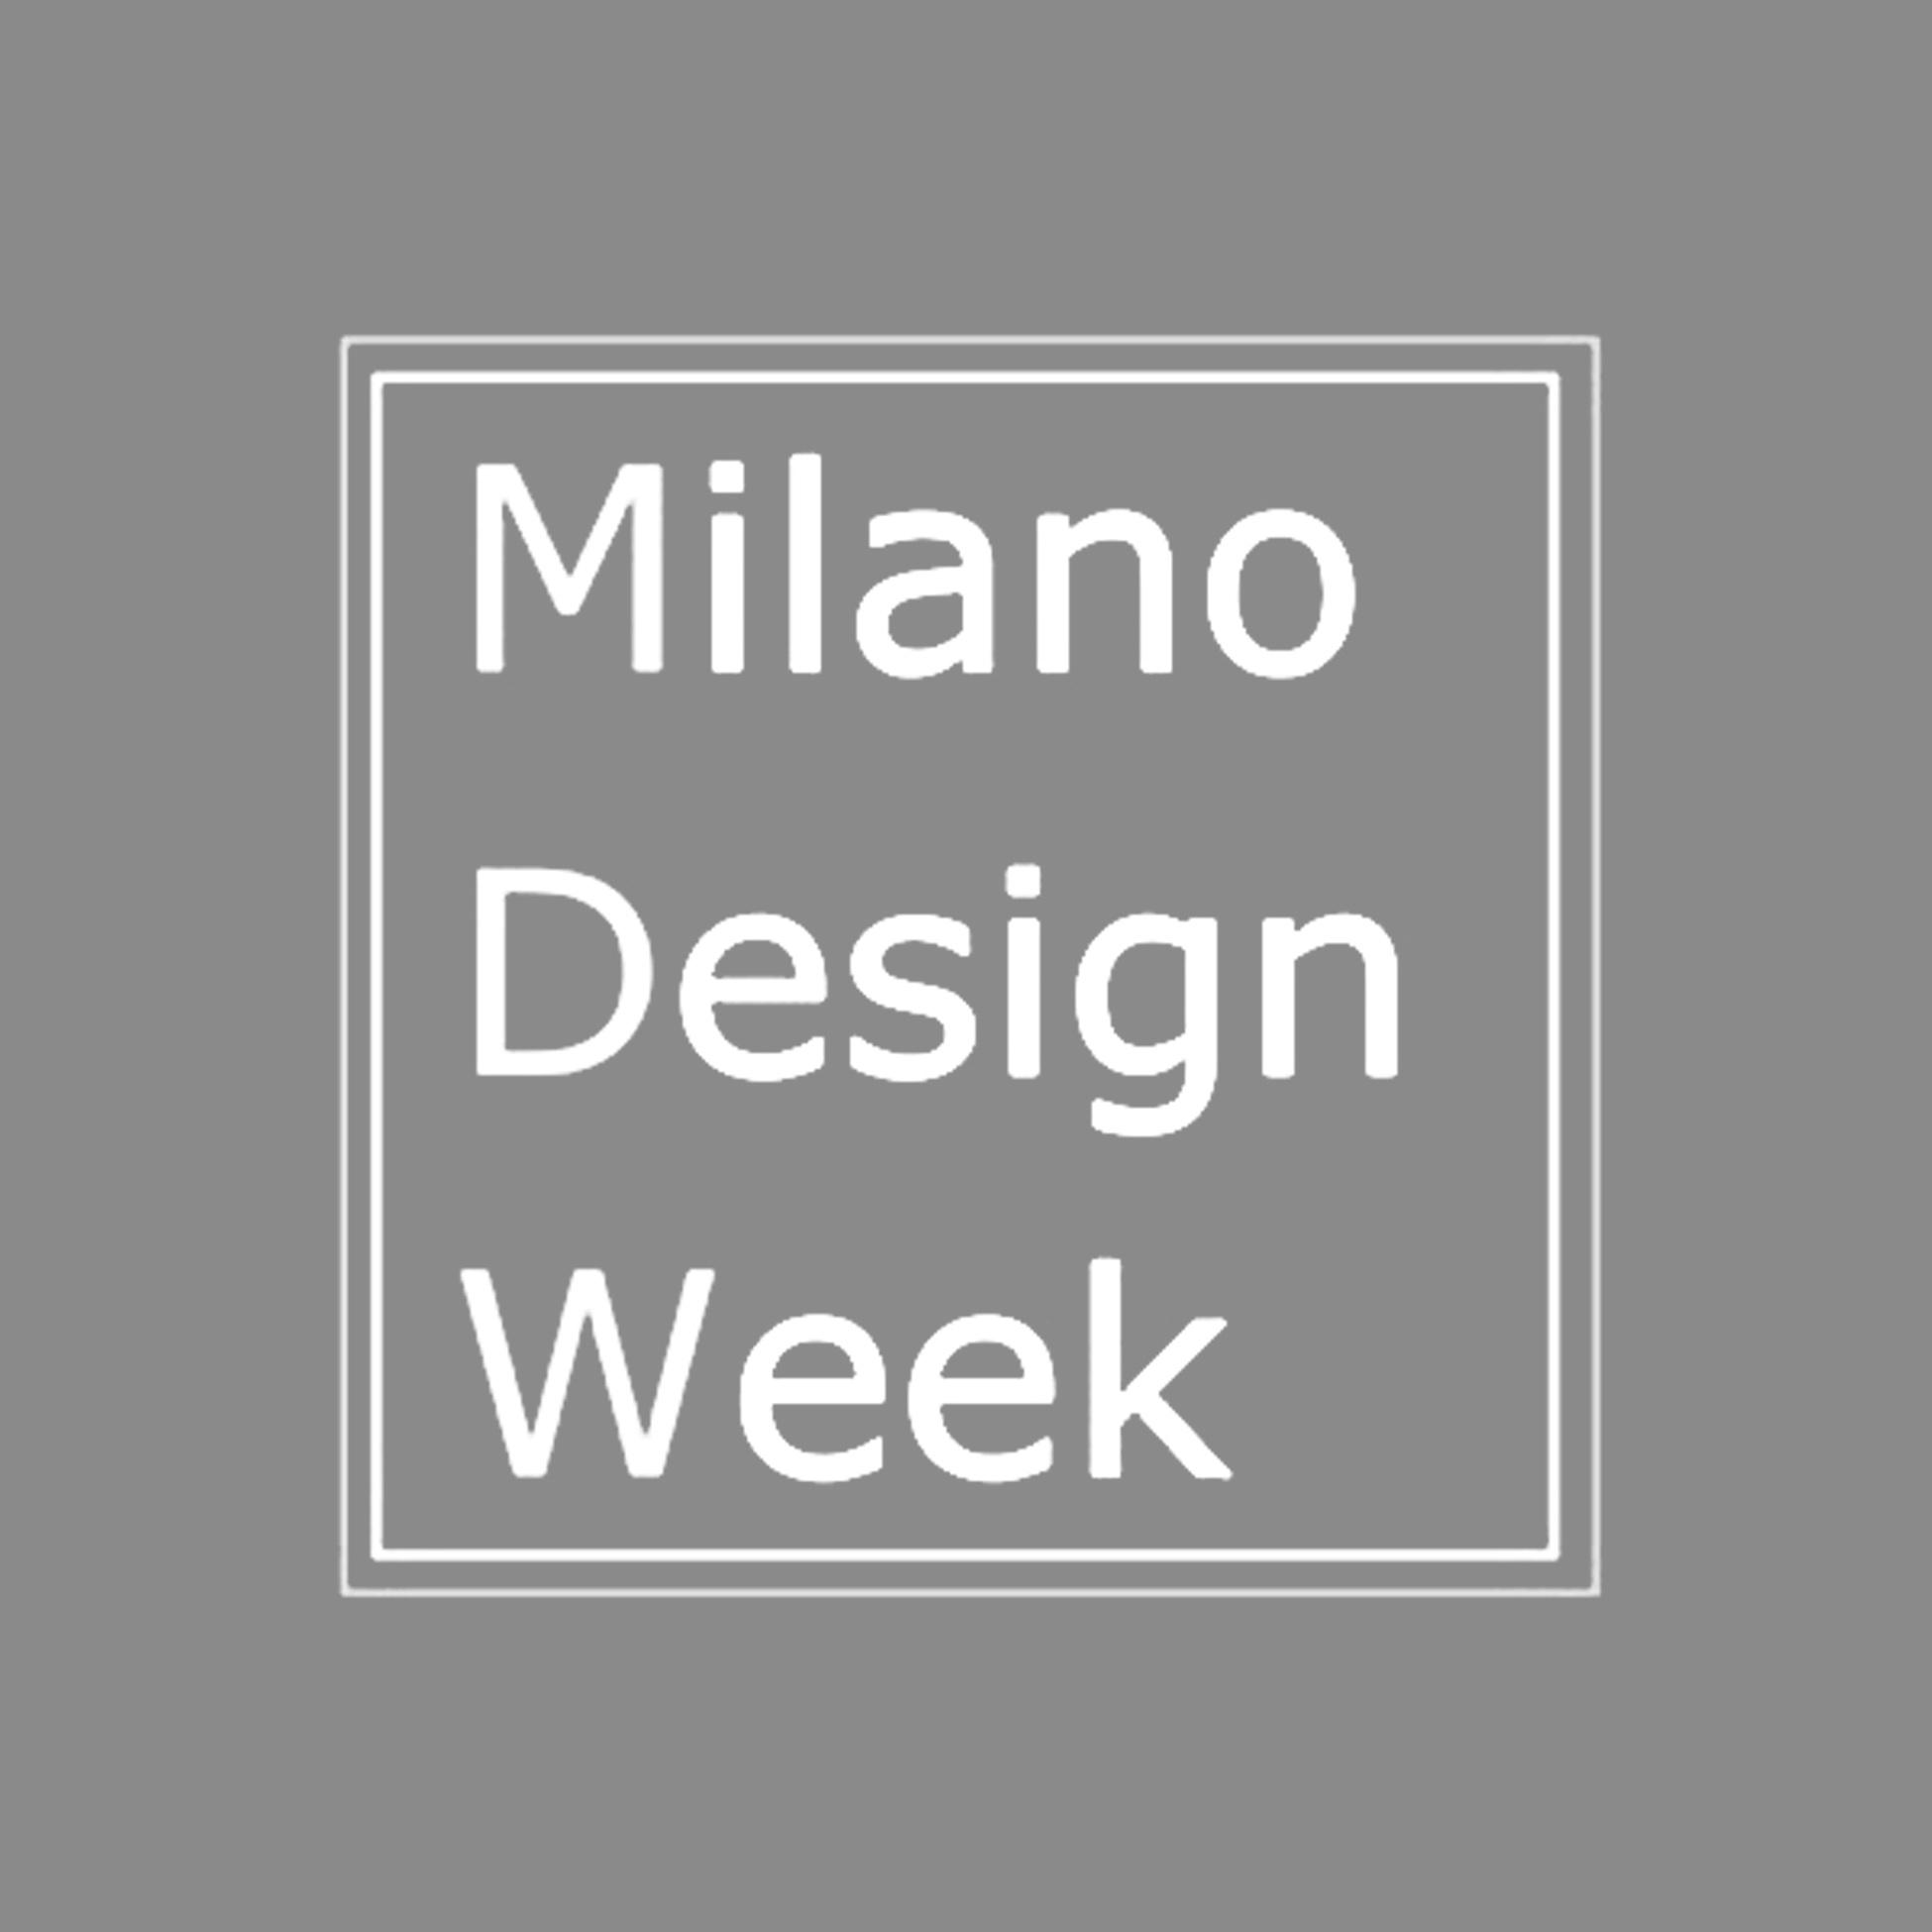 Milano-Design-Week_USE.jpg